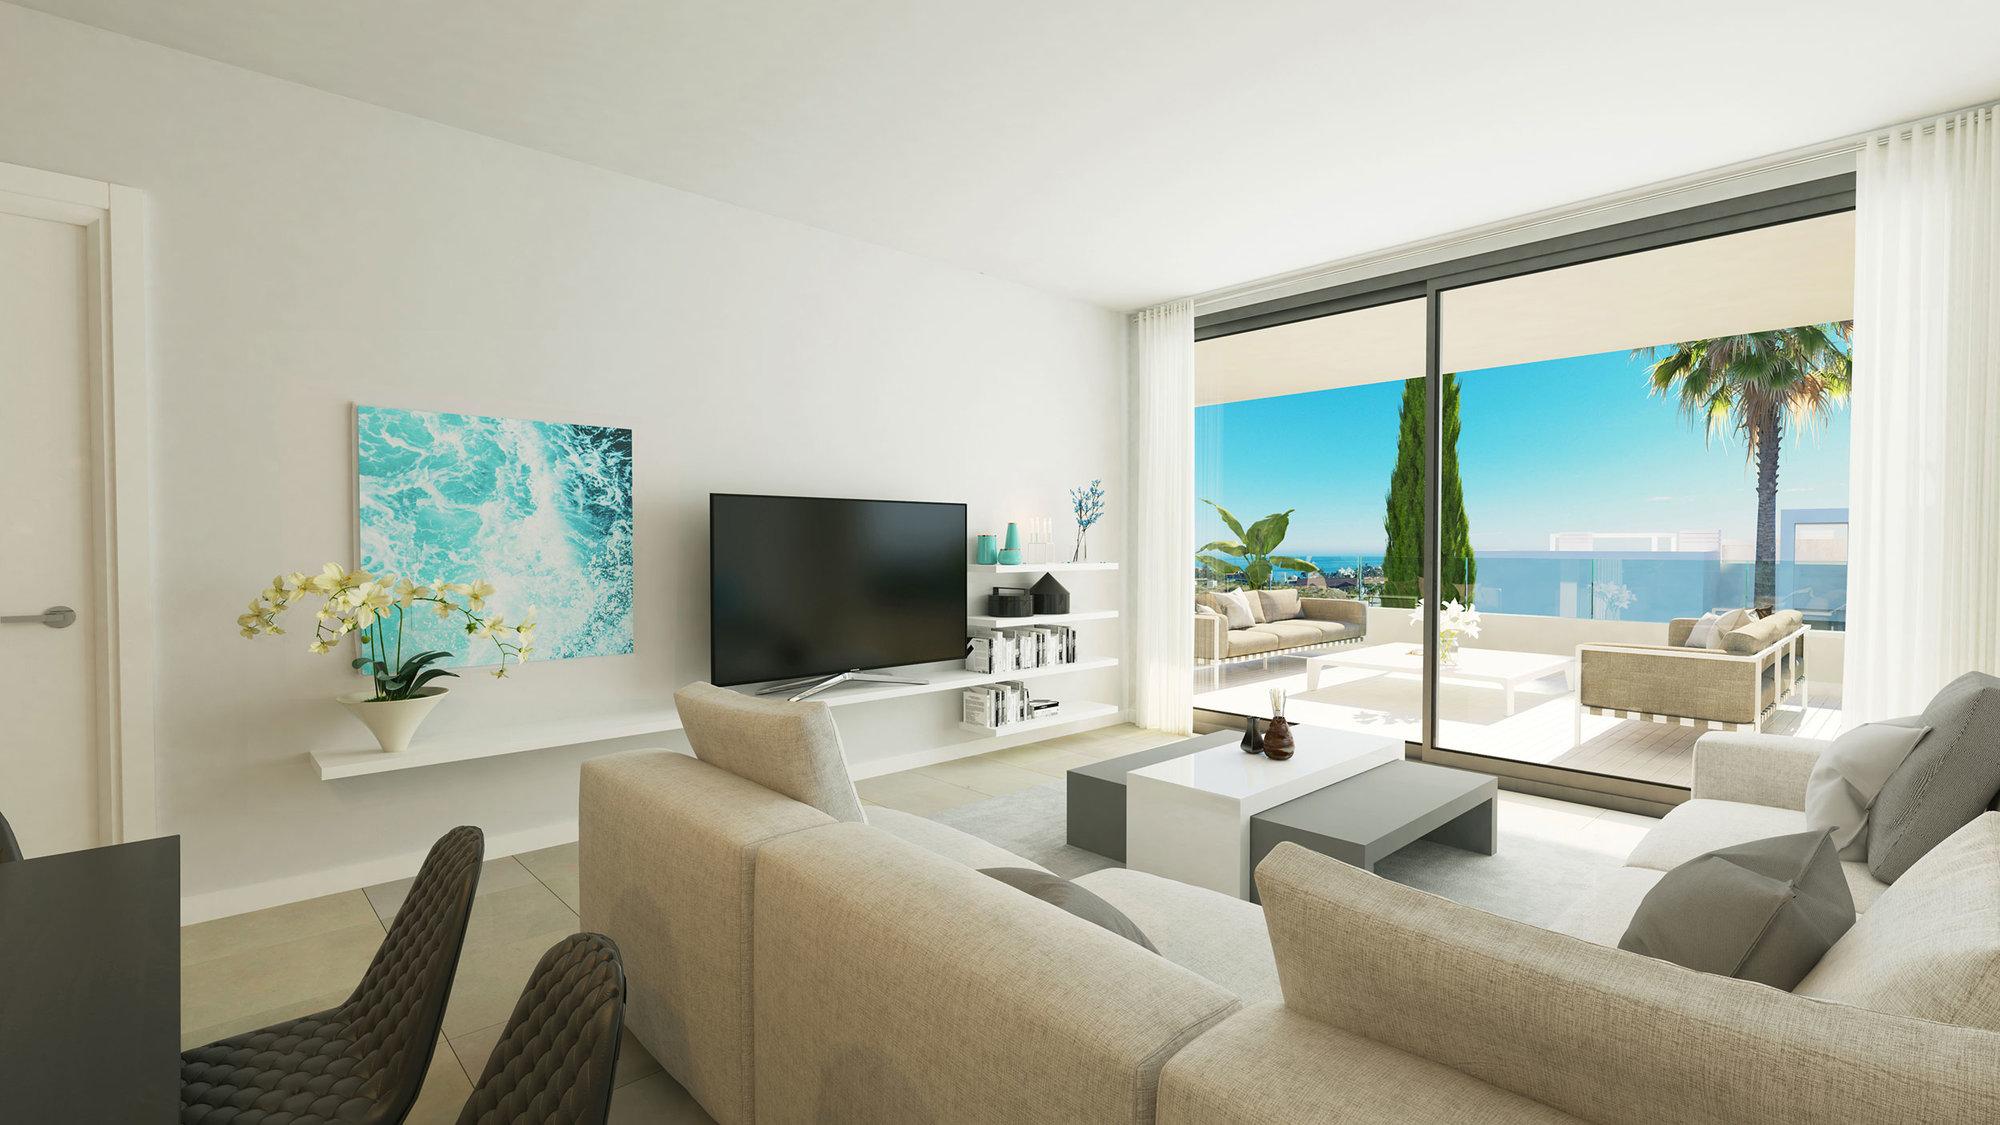 2 bedroom, 2 bathroom Apartment for sale in Estepona - MAS PROPERTY ...